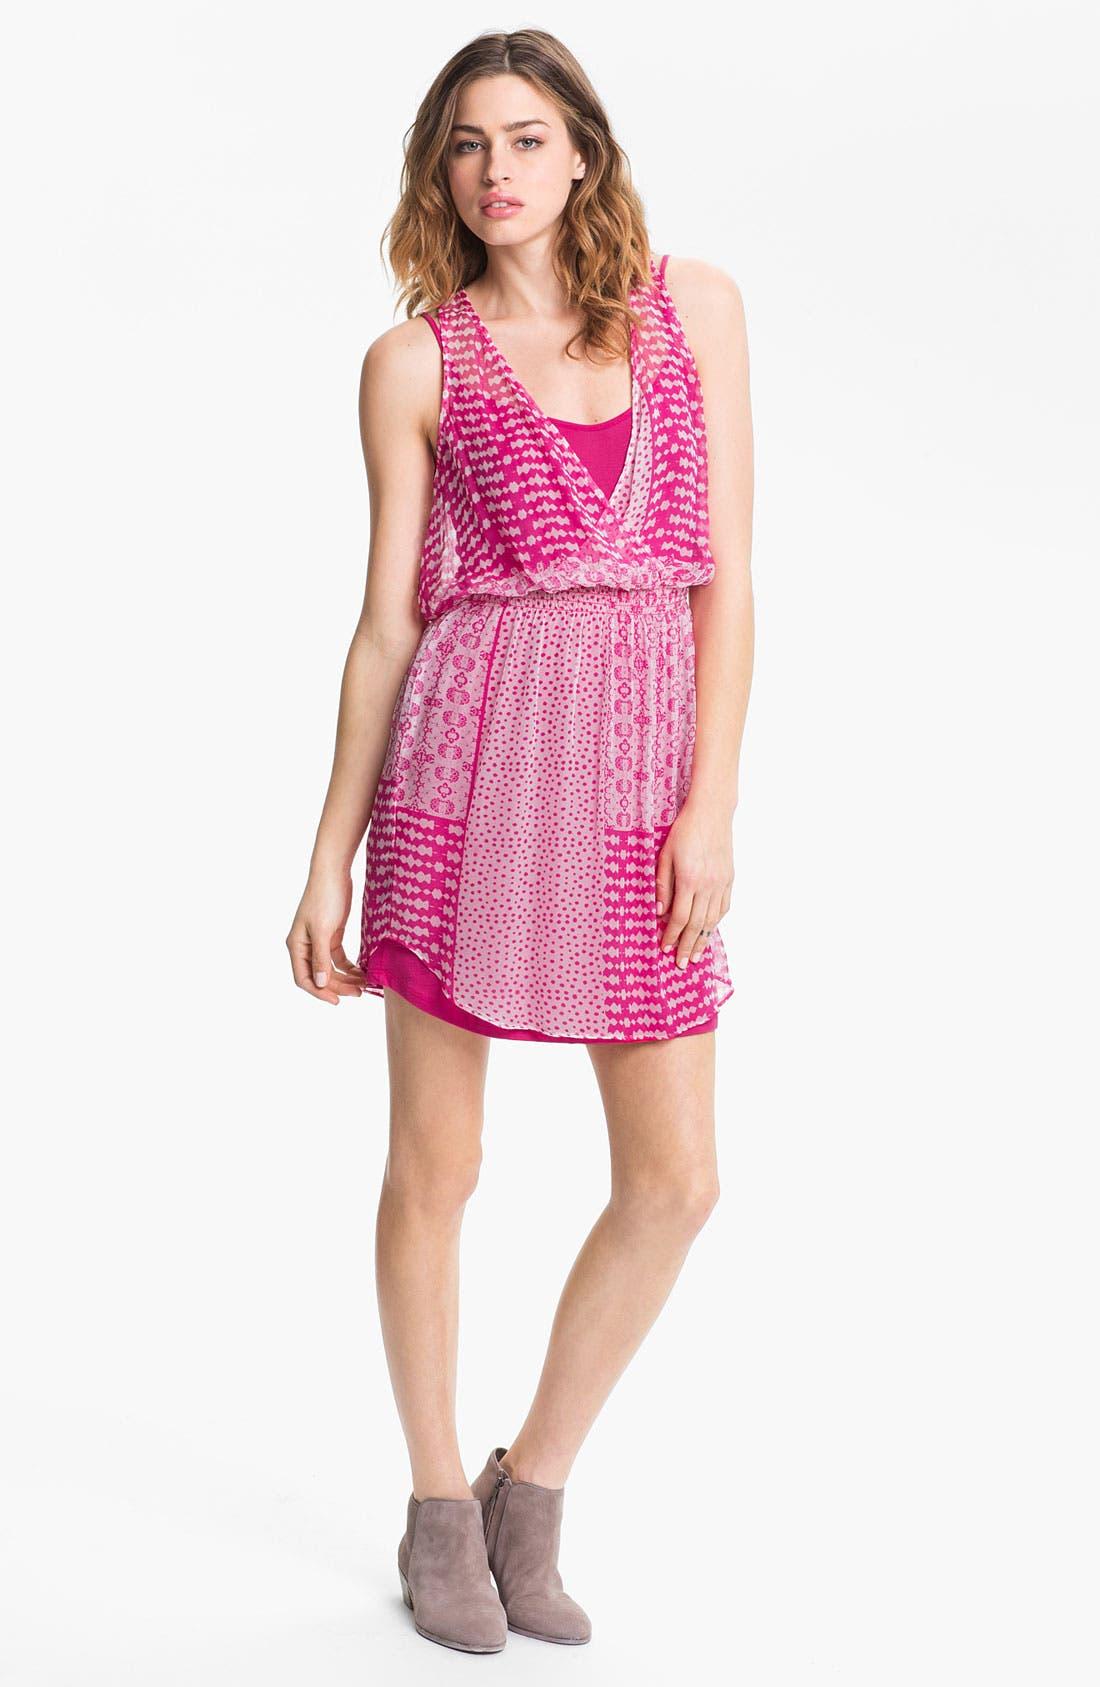 Alternate Image 1 Selected - Ella Moss 'Lexi' Mix Print Dress